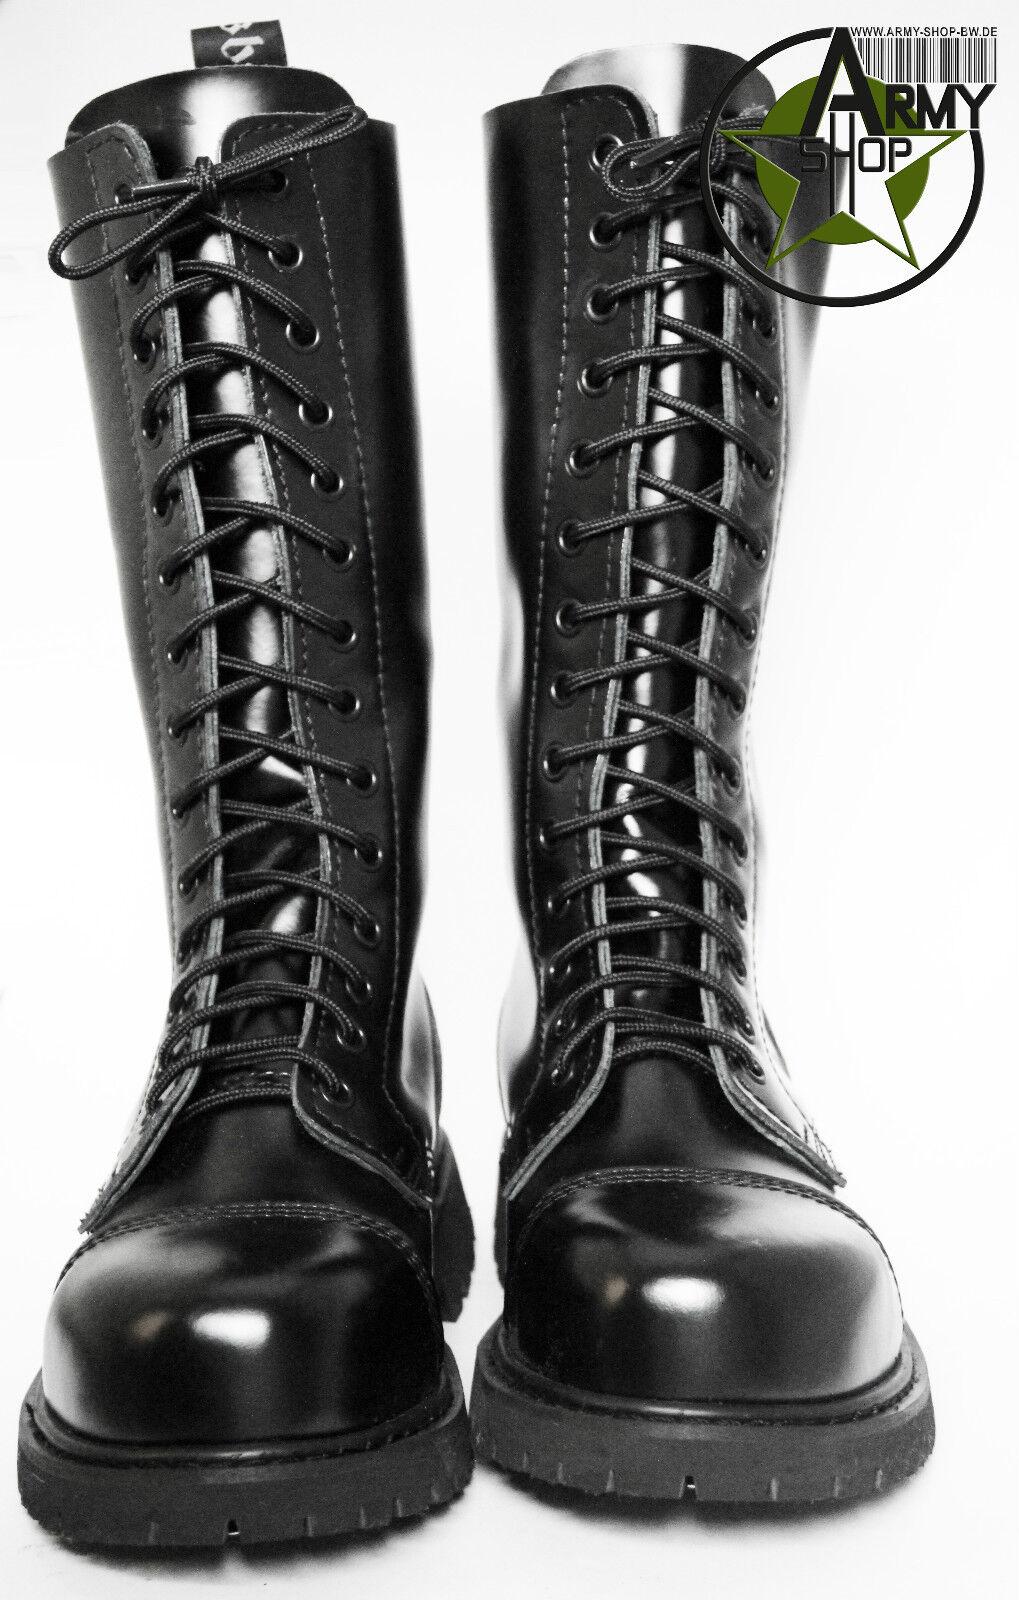 14-hole Ranger Boots Combat Boots Boots Combat Boots 41 42 43 44 45 46 47